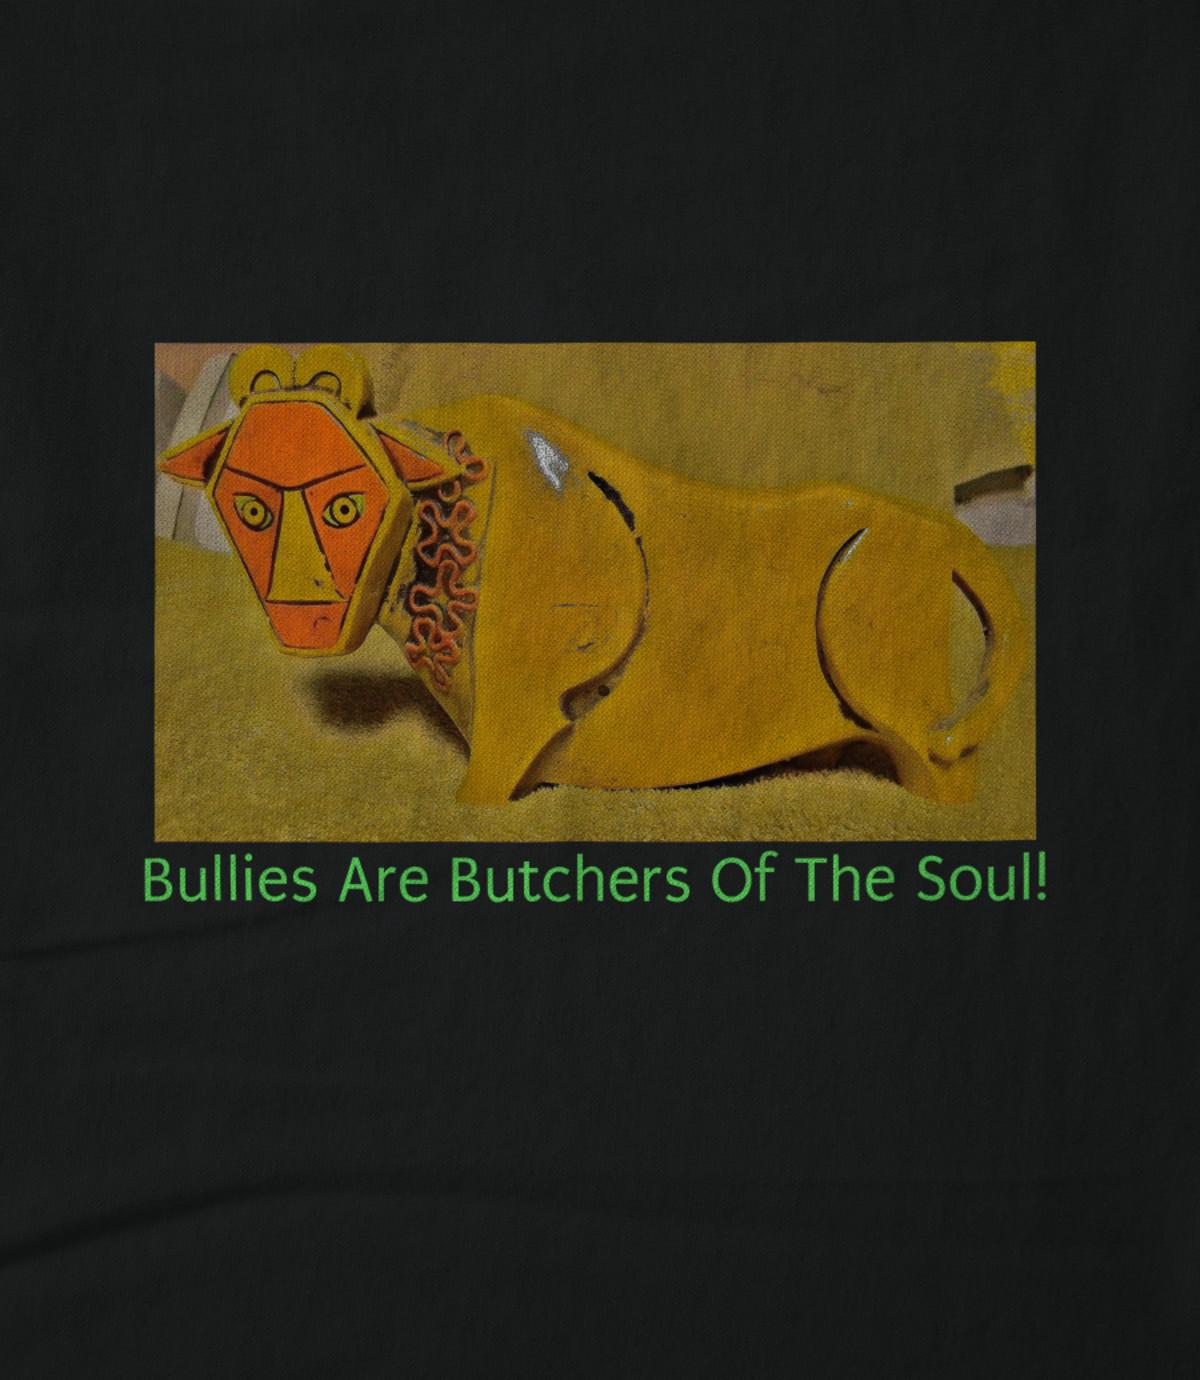 Matthew f  blowers iii  c  2017 bullies are butchers of the soul  1506272710